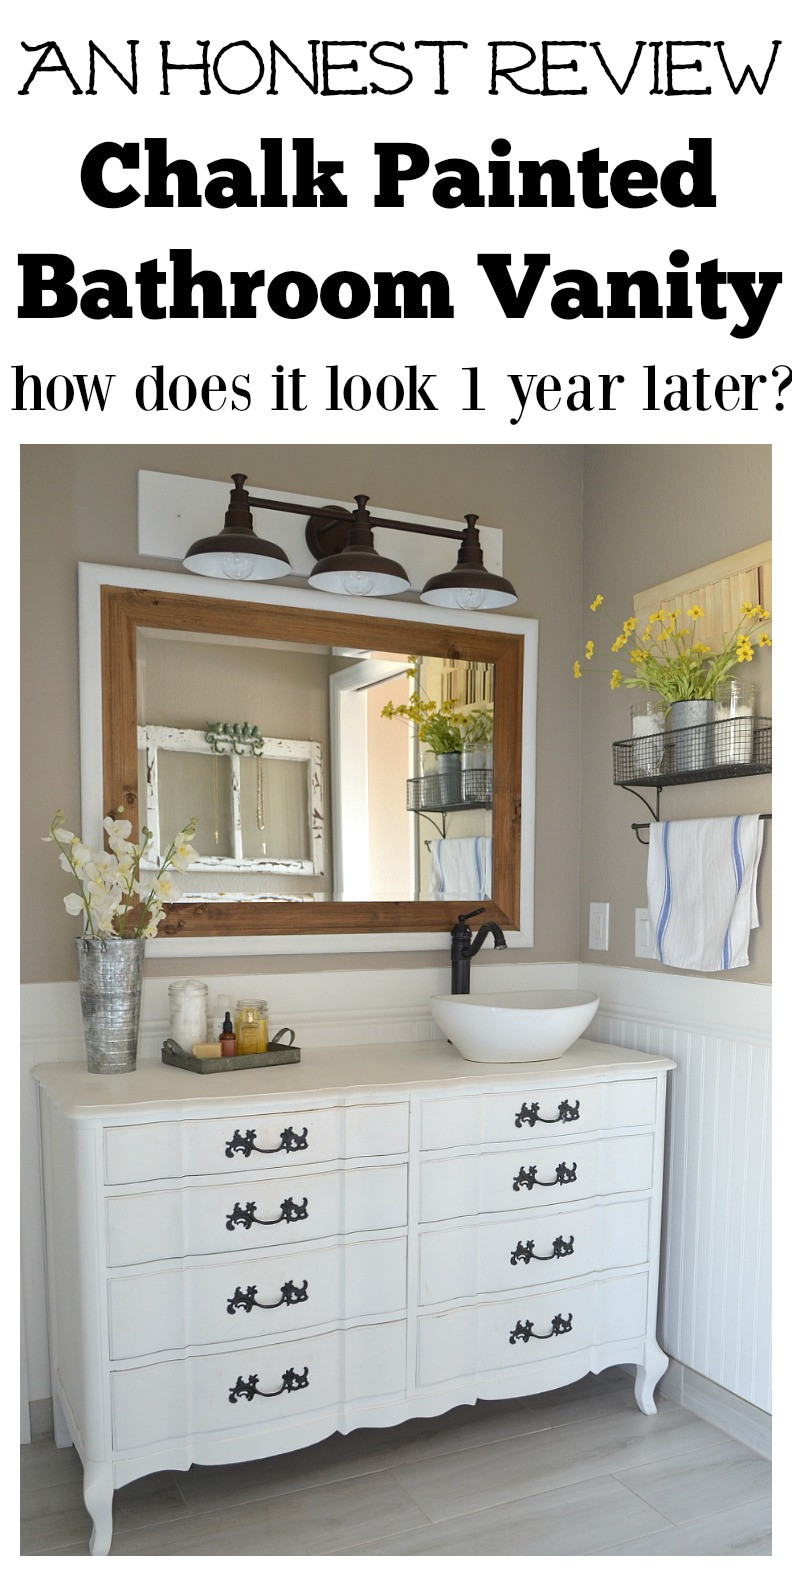 Paint To Use In Bathroom  Honest Review of My Chalk Painted Bathroom Vanities